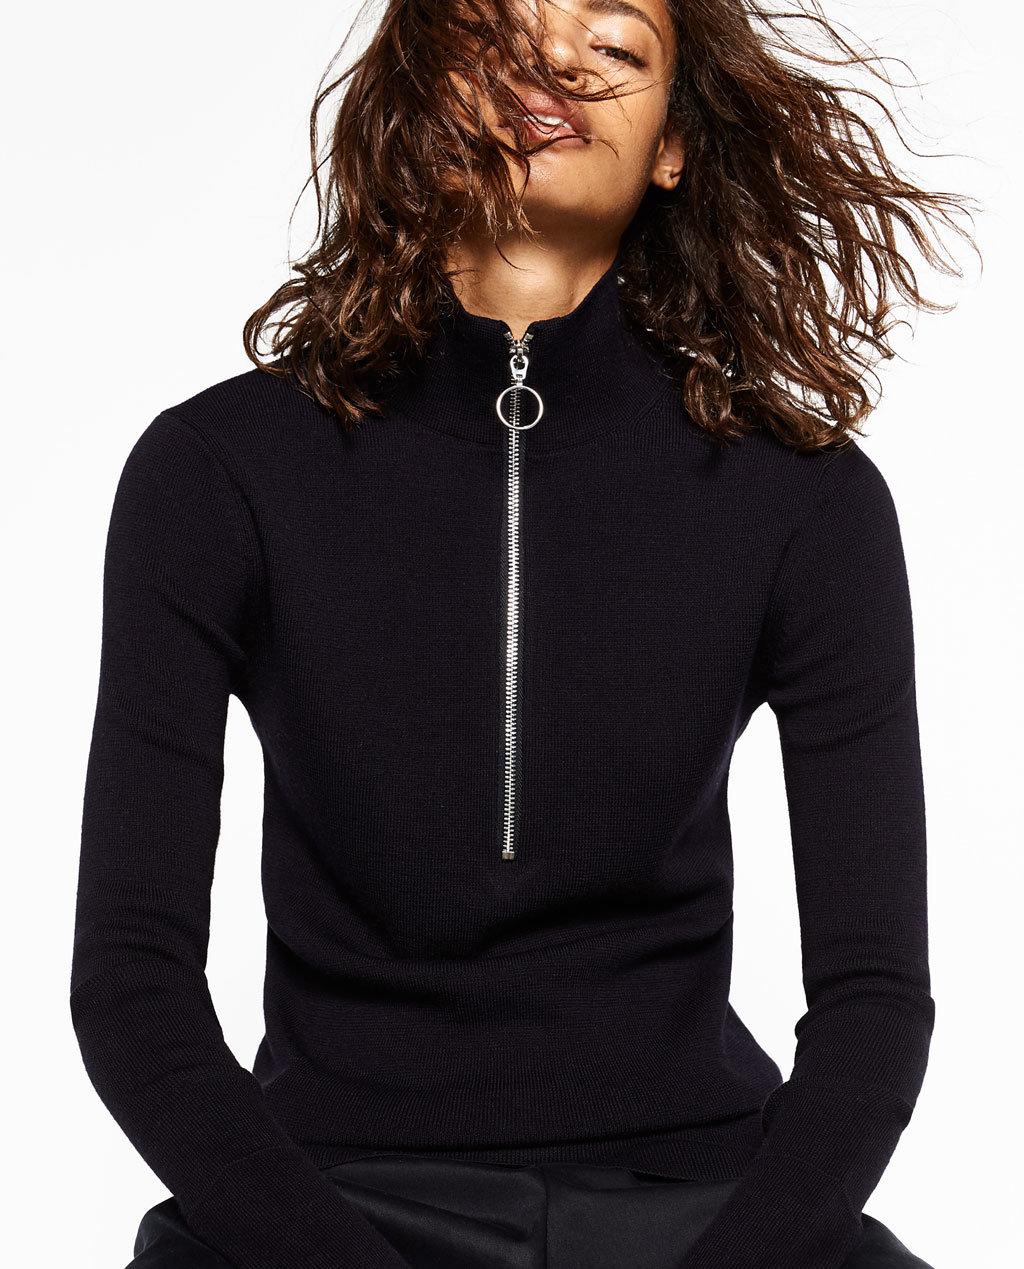 Fashioned Women Knitting Sweater with Zipper